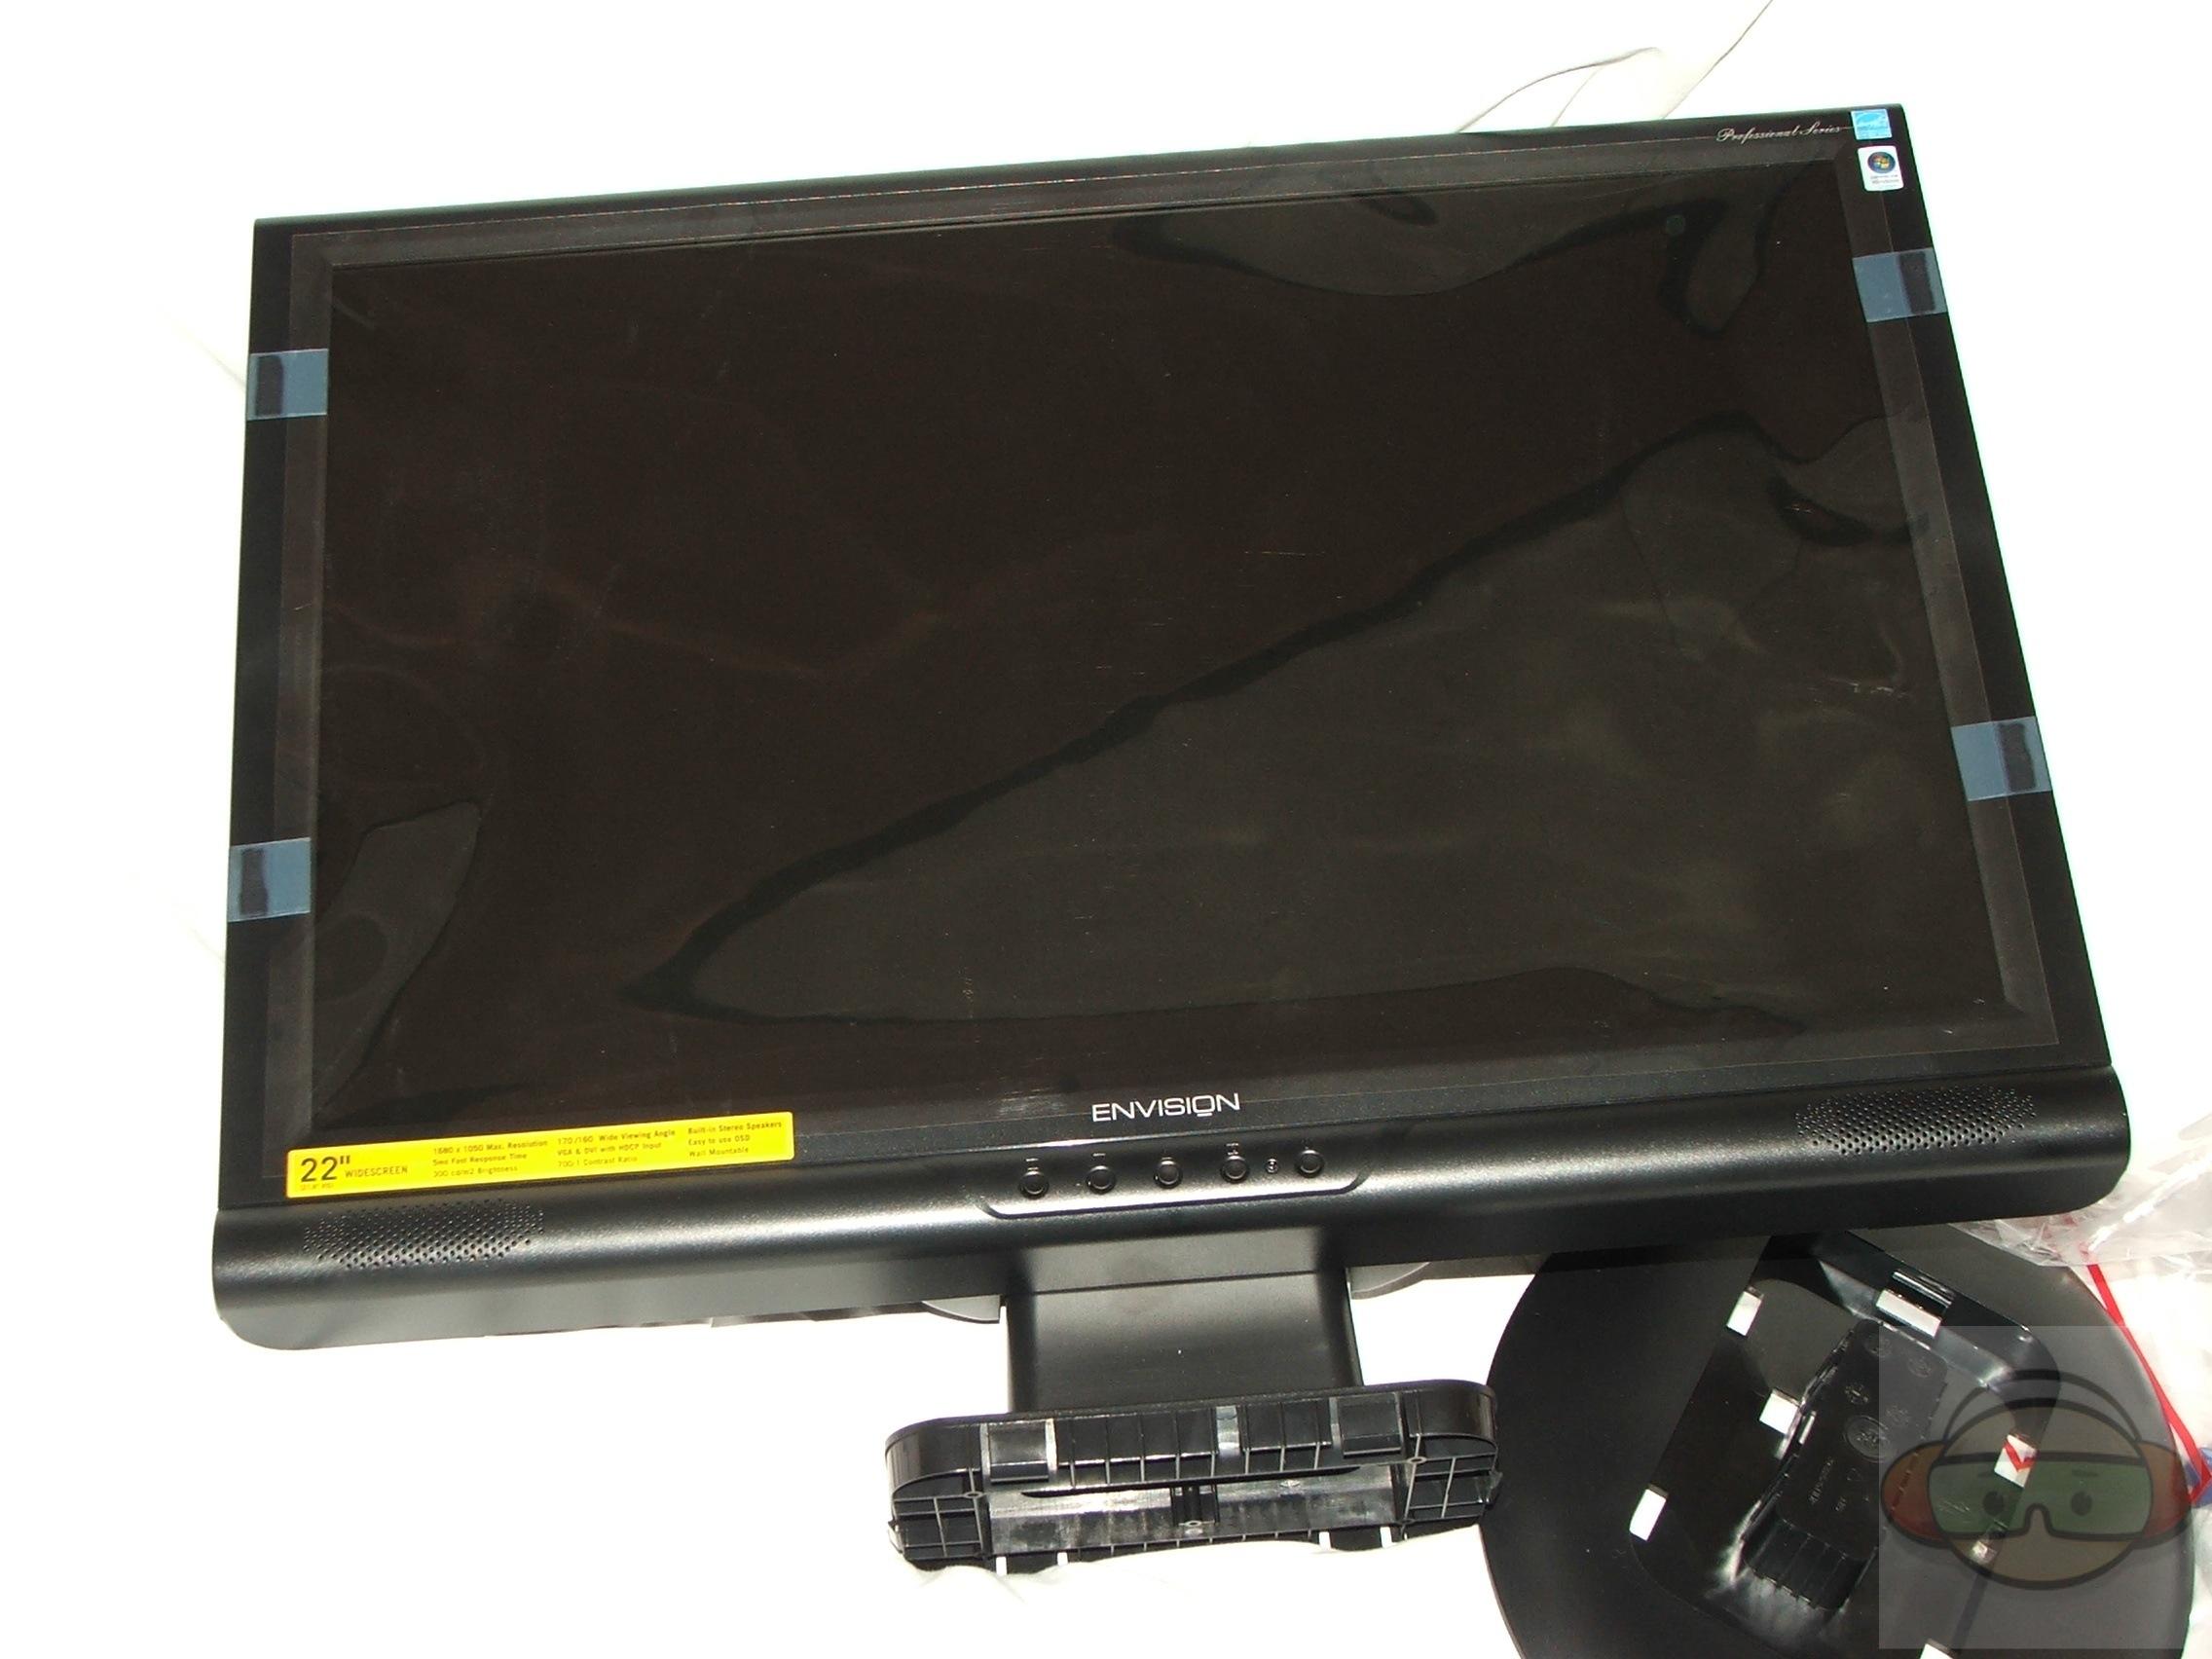 Envision lm 700 Monitor Manual